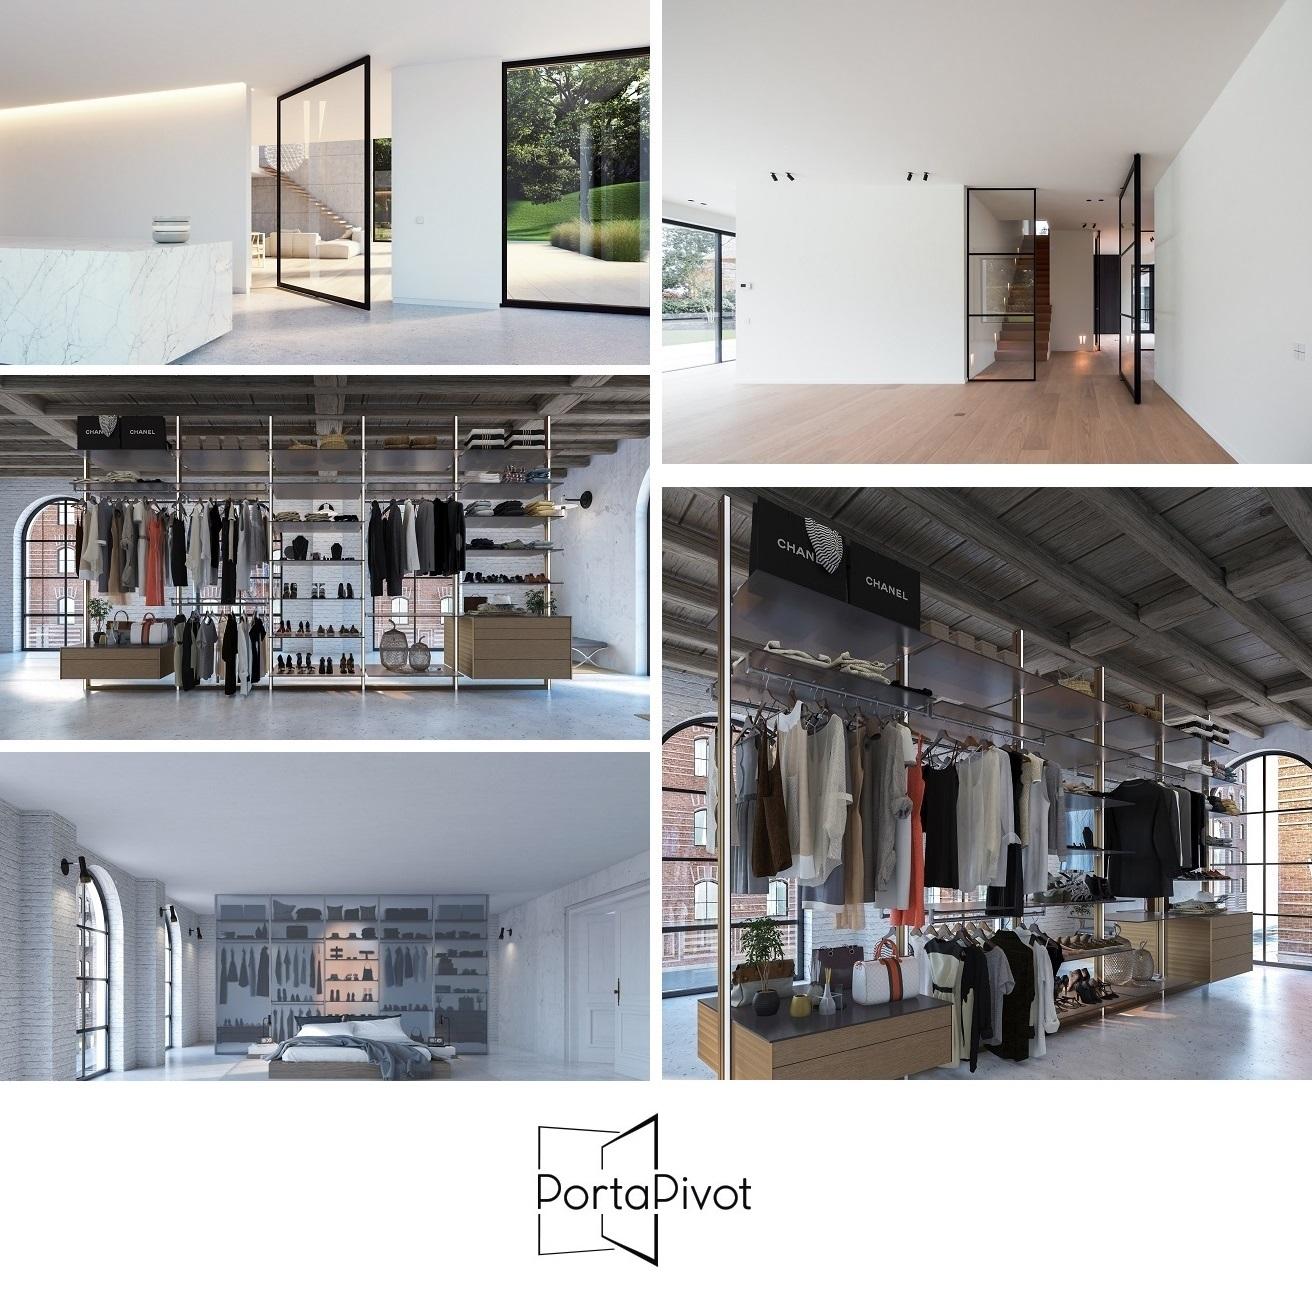 IMM Cologne 2019: PORTAPIVOT präsentiert Pivoting room dividers & Dress Wall